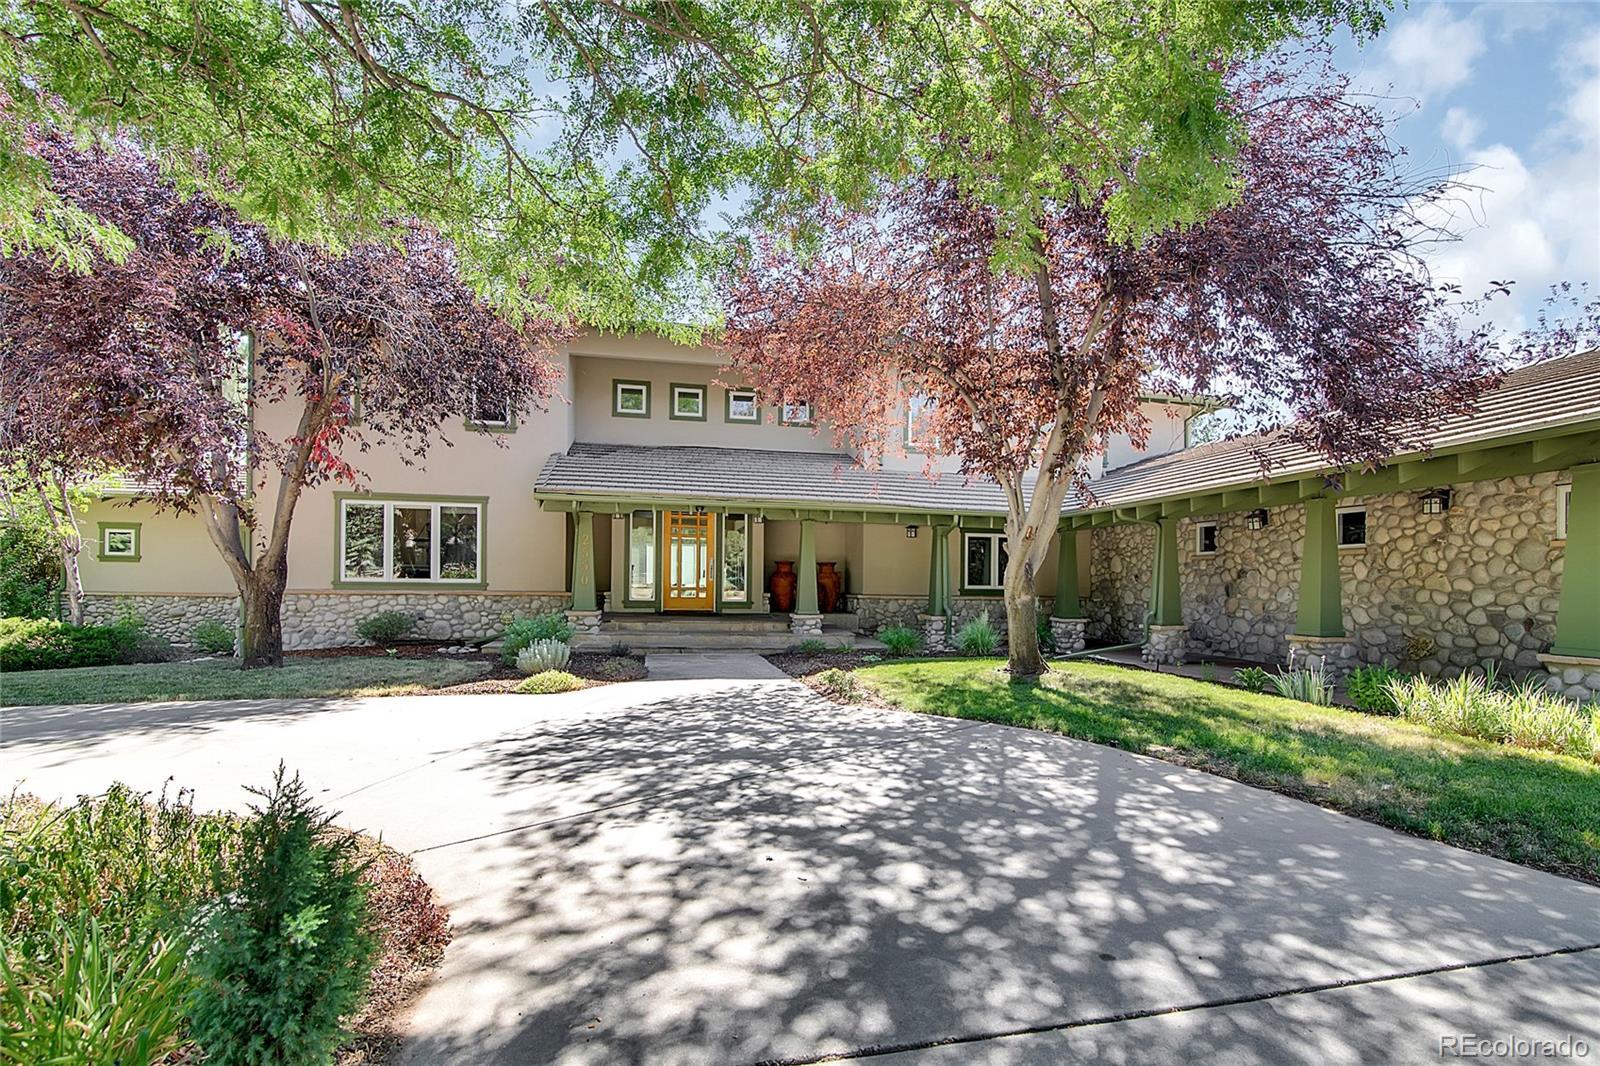 2550 E WILLAMETTE Lane Property Photo - Greenwood Village, CO real estate listing